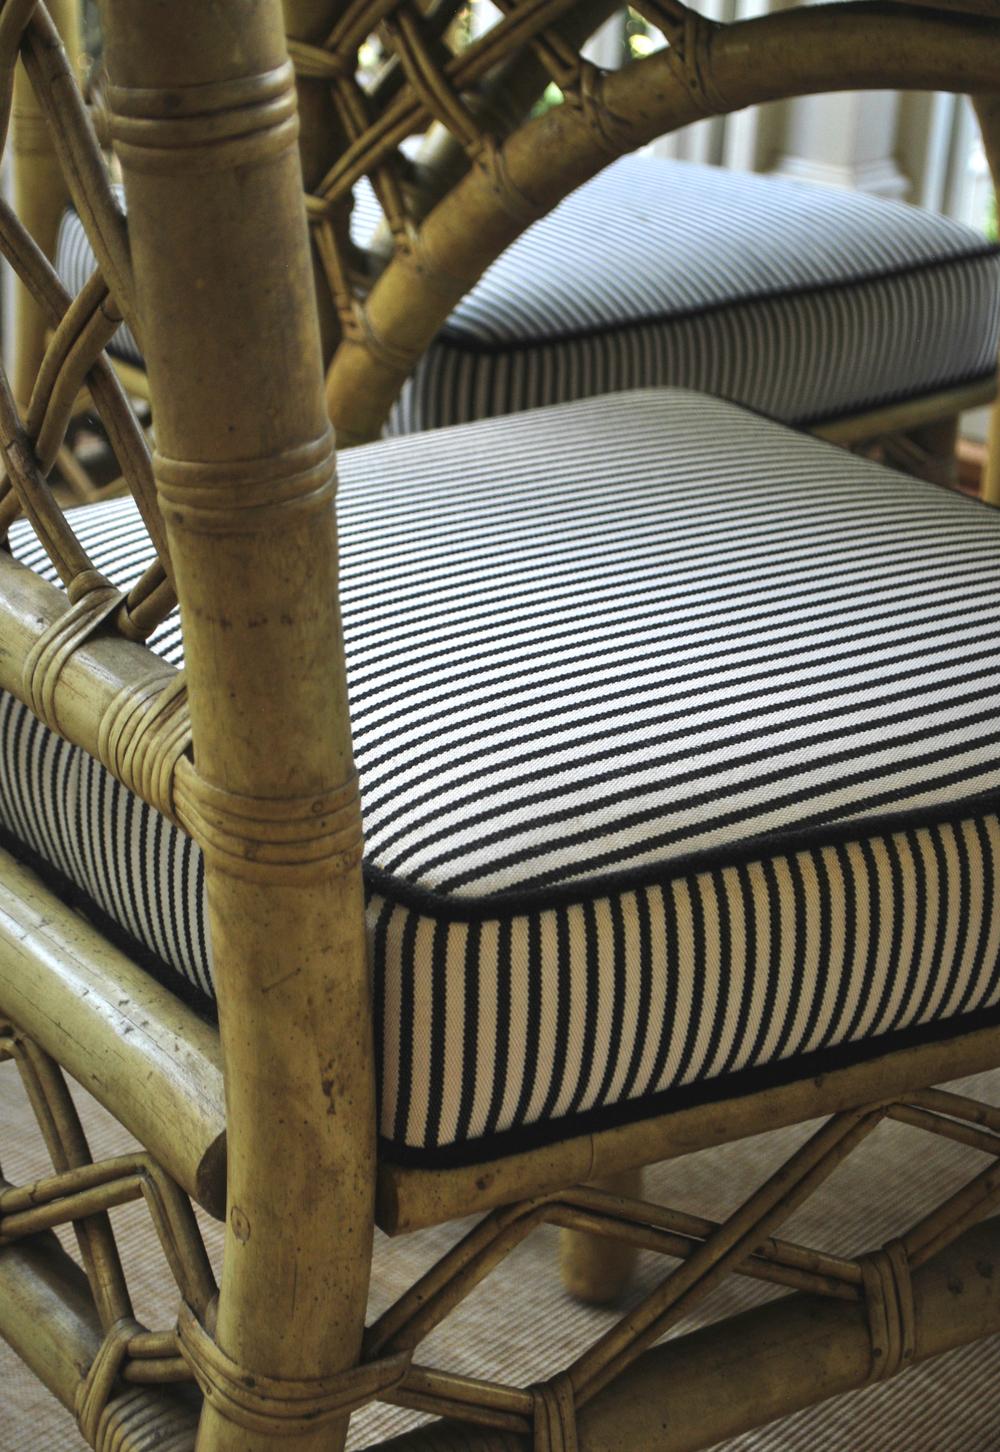 bambooseatdetail.jpg